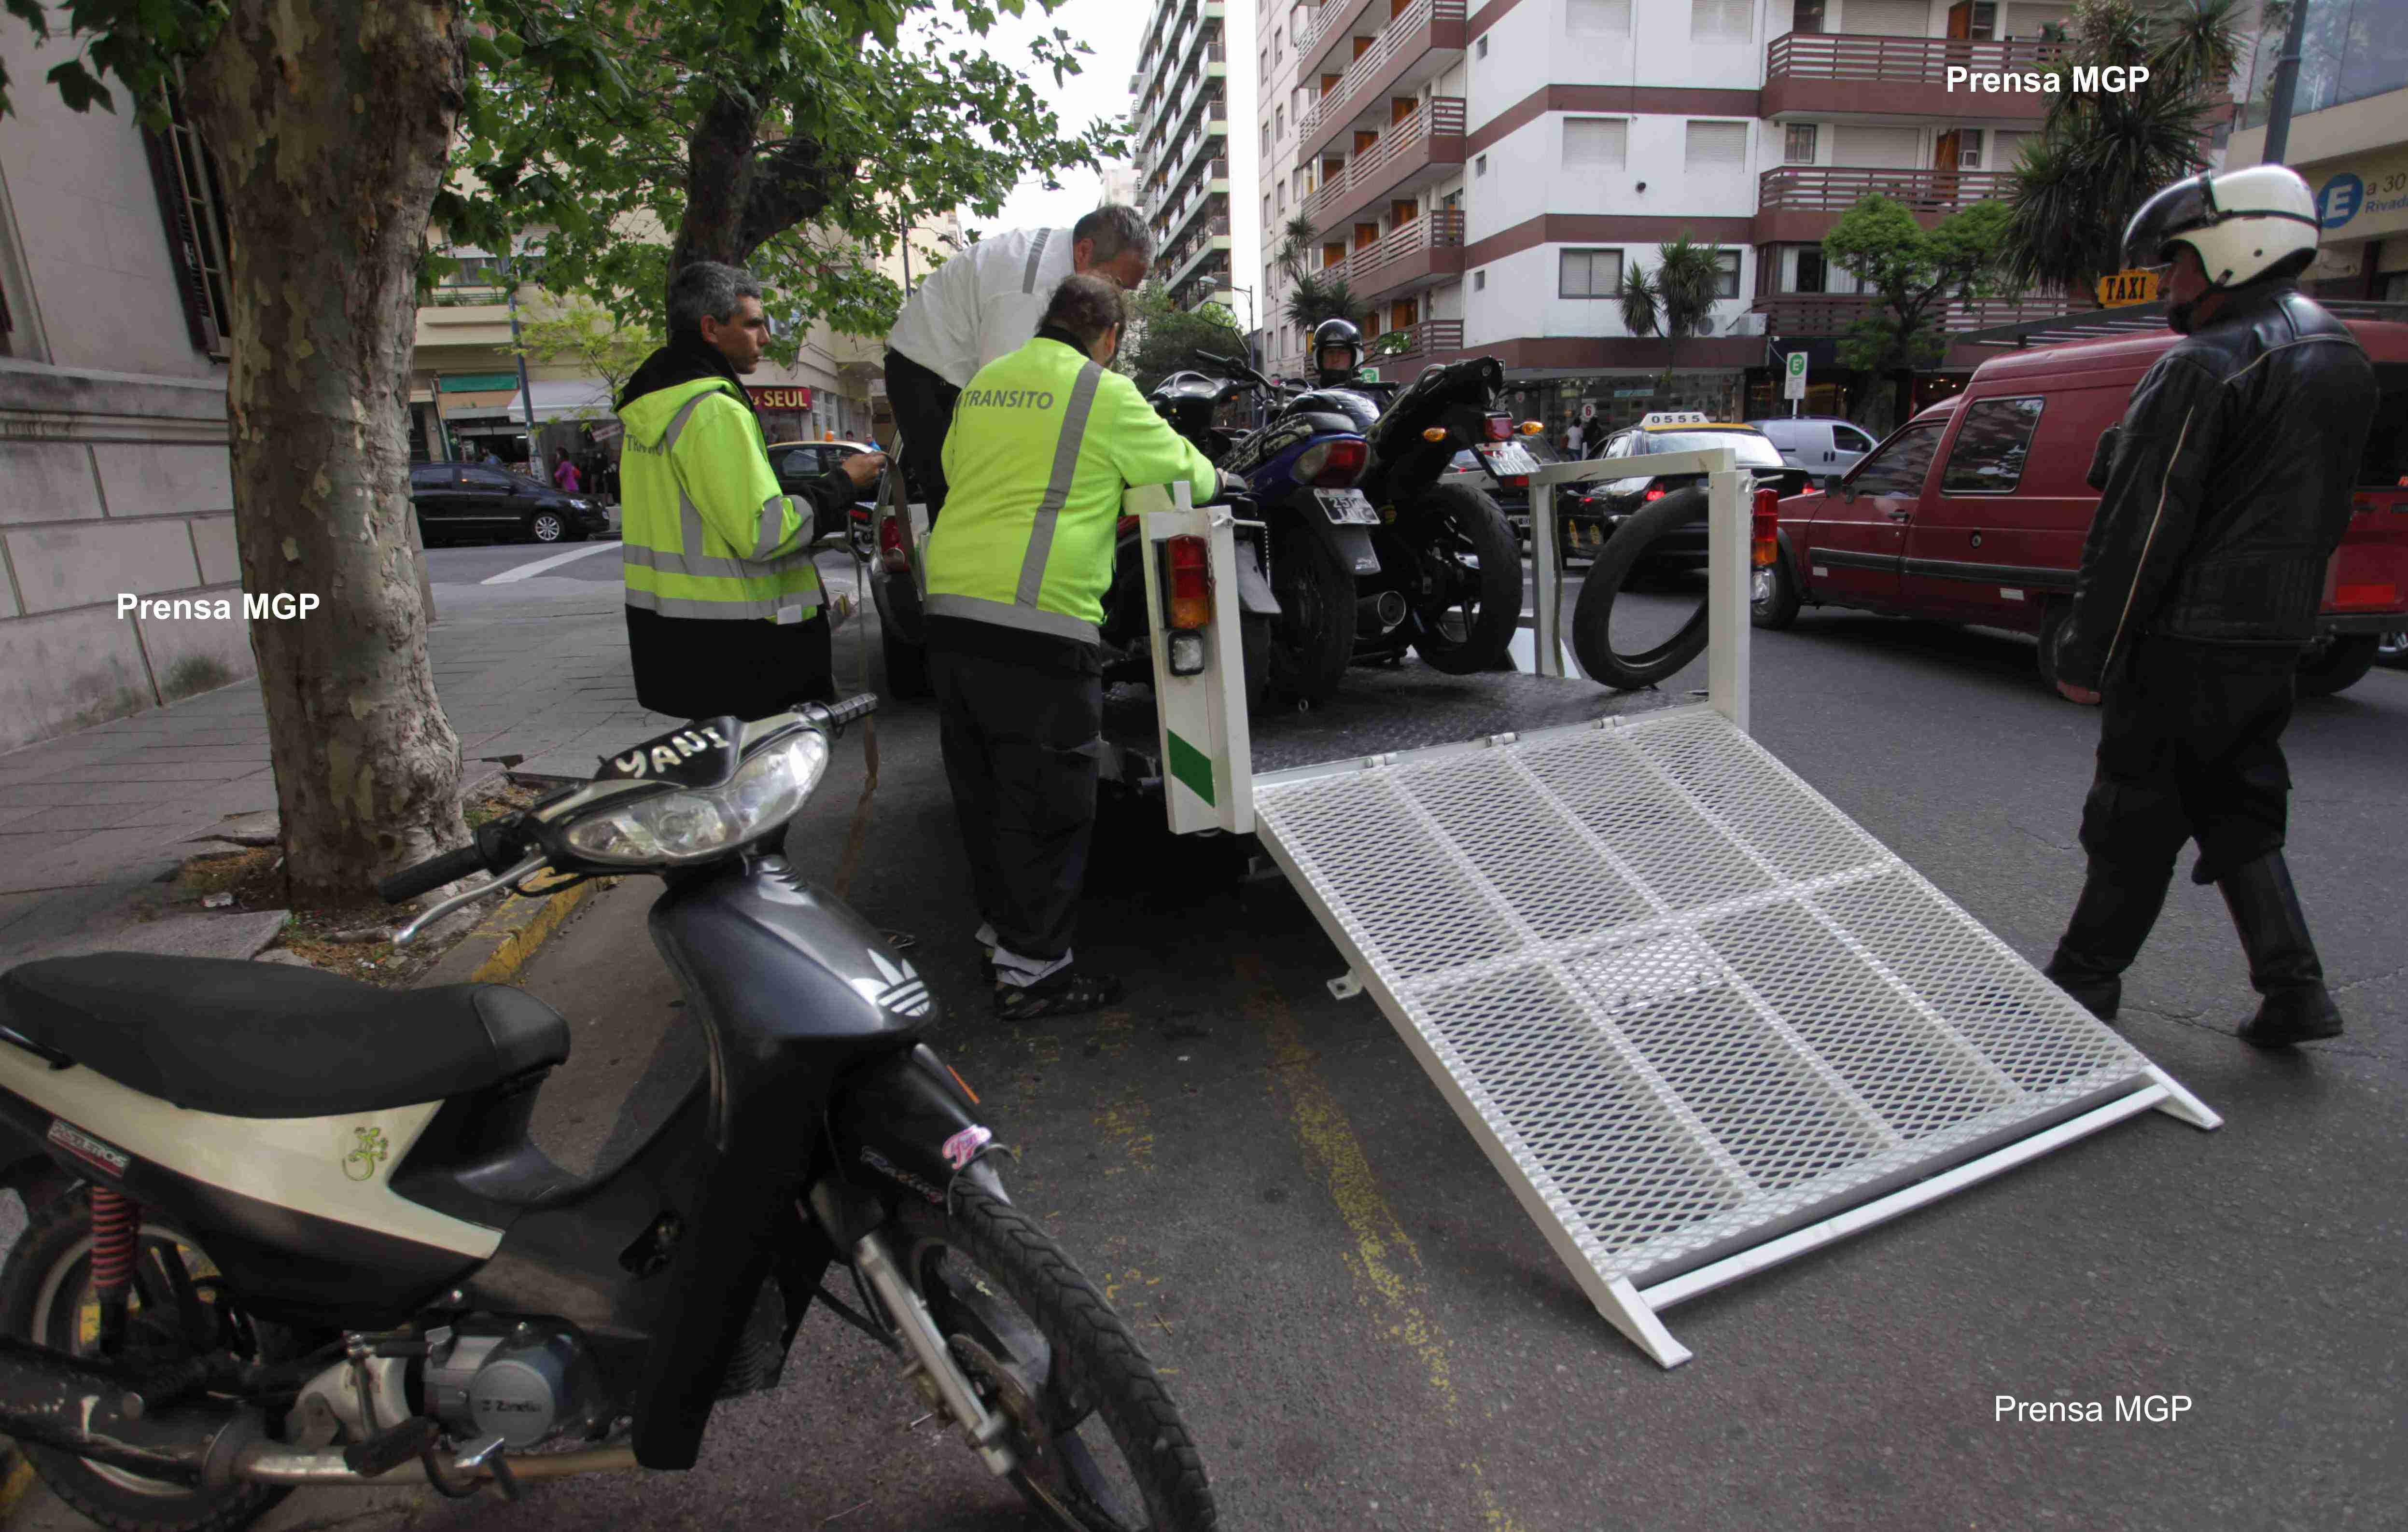 Foto MGP - Control - Movilidad Urbana - Tránsito - Motos